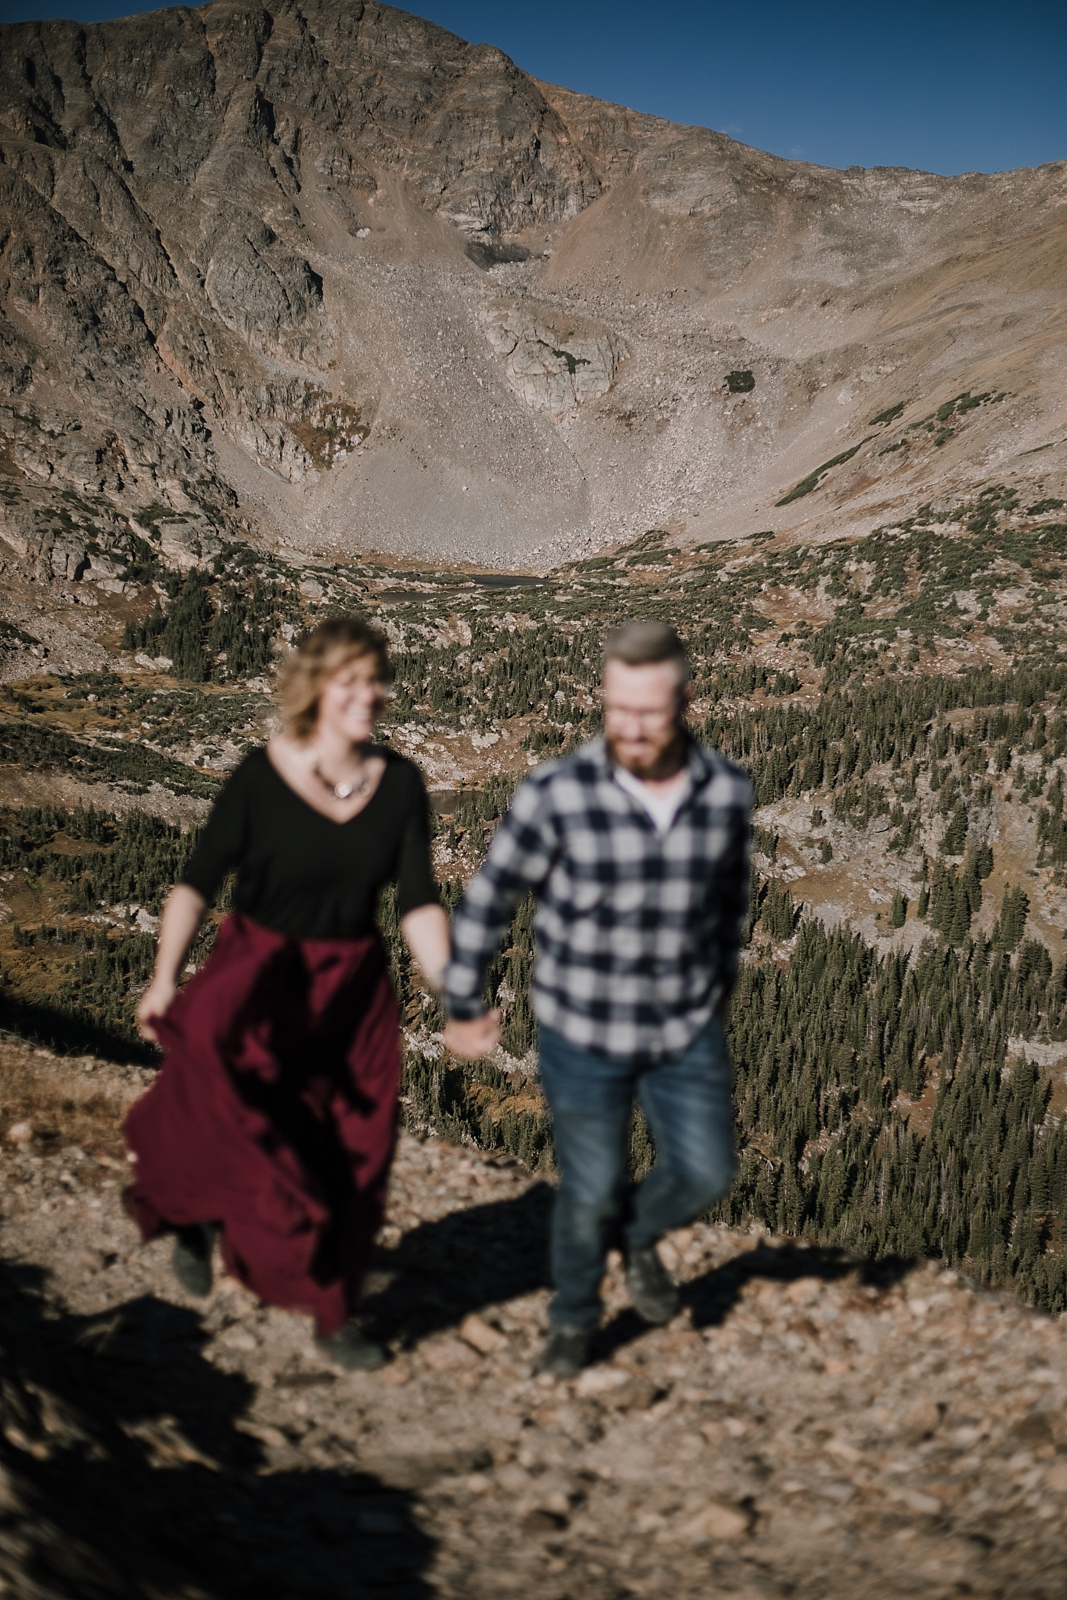 couple hiking, colorado 13er, hike little echo lake, backpacking james peak wilderness, hike james peak lake, james peak elopement, winter park elopement, backpacking winter park